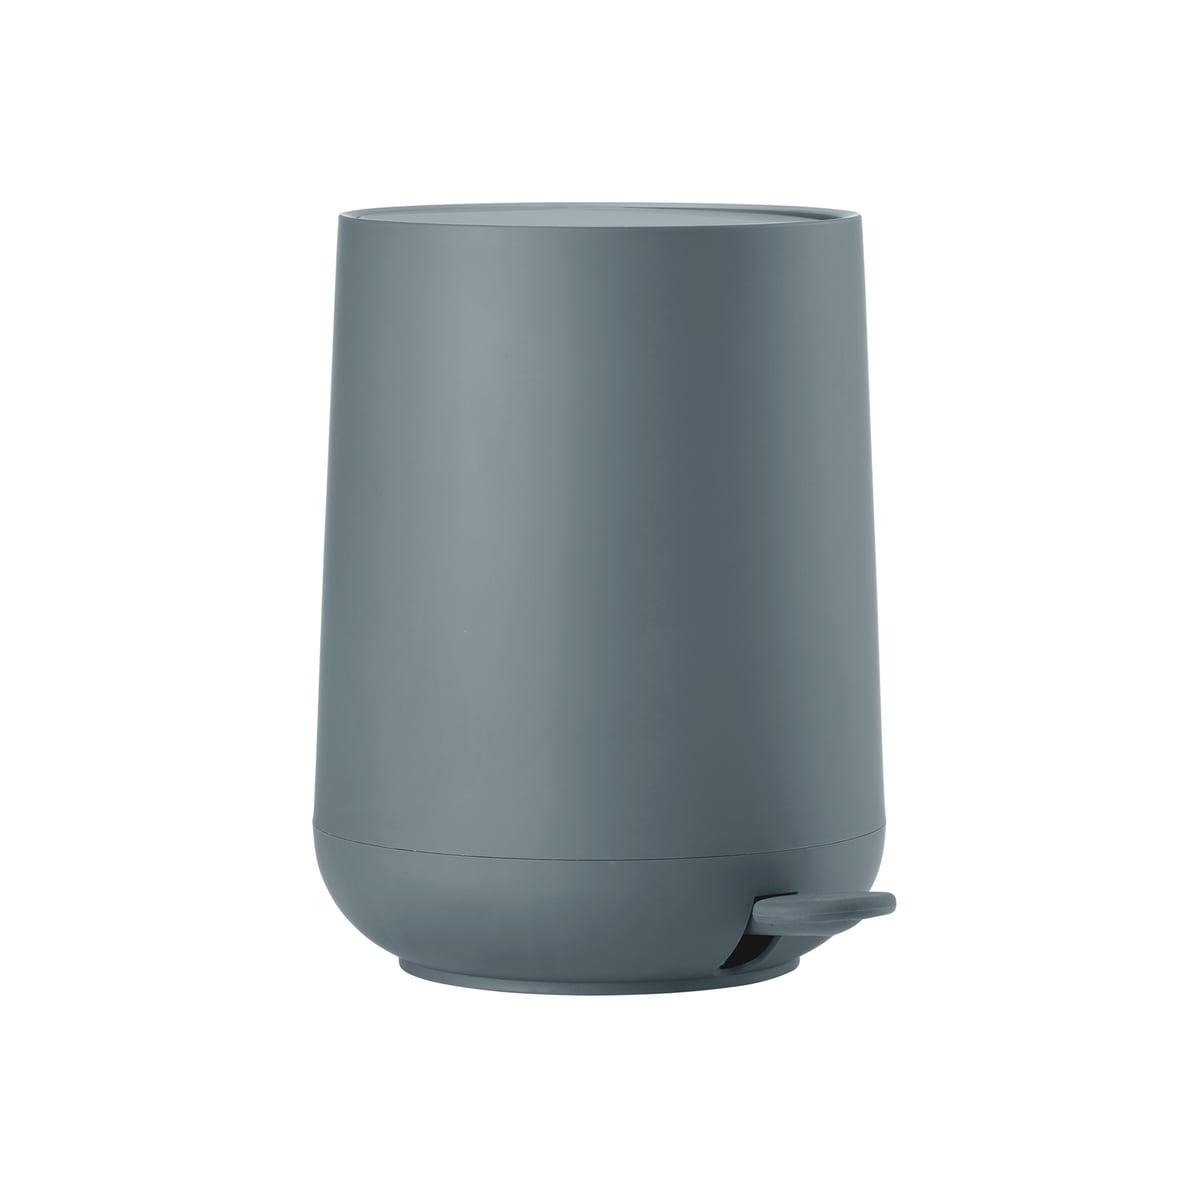 Zone Denmark - Nova Treteimer 3 L, grau | Bad > Bad-Accessoires > Kosmetikeimer | Grau | Abs/ soft-touch | Zone